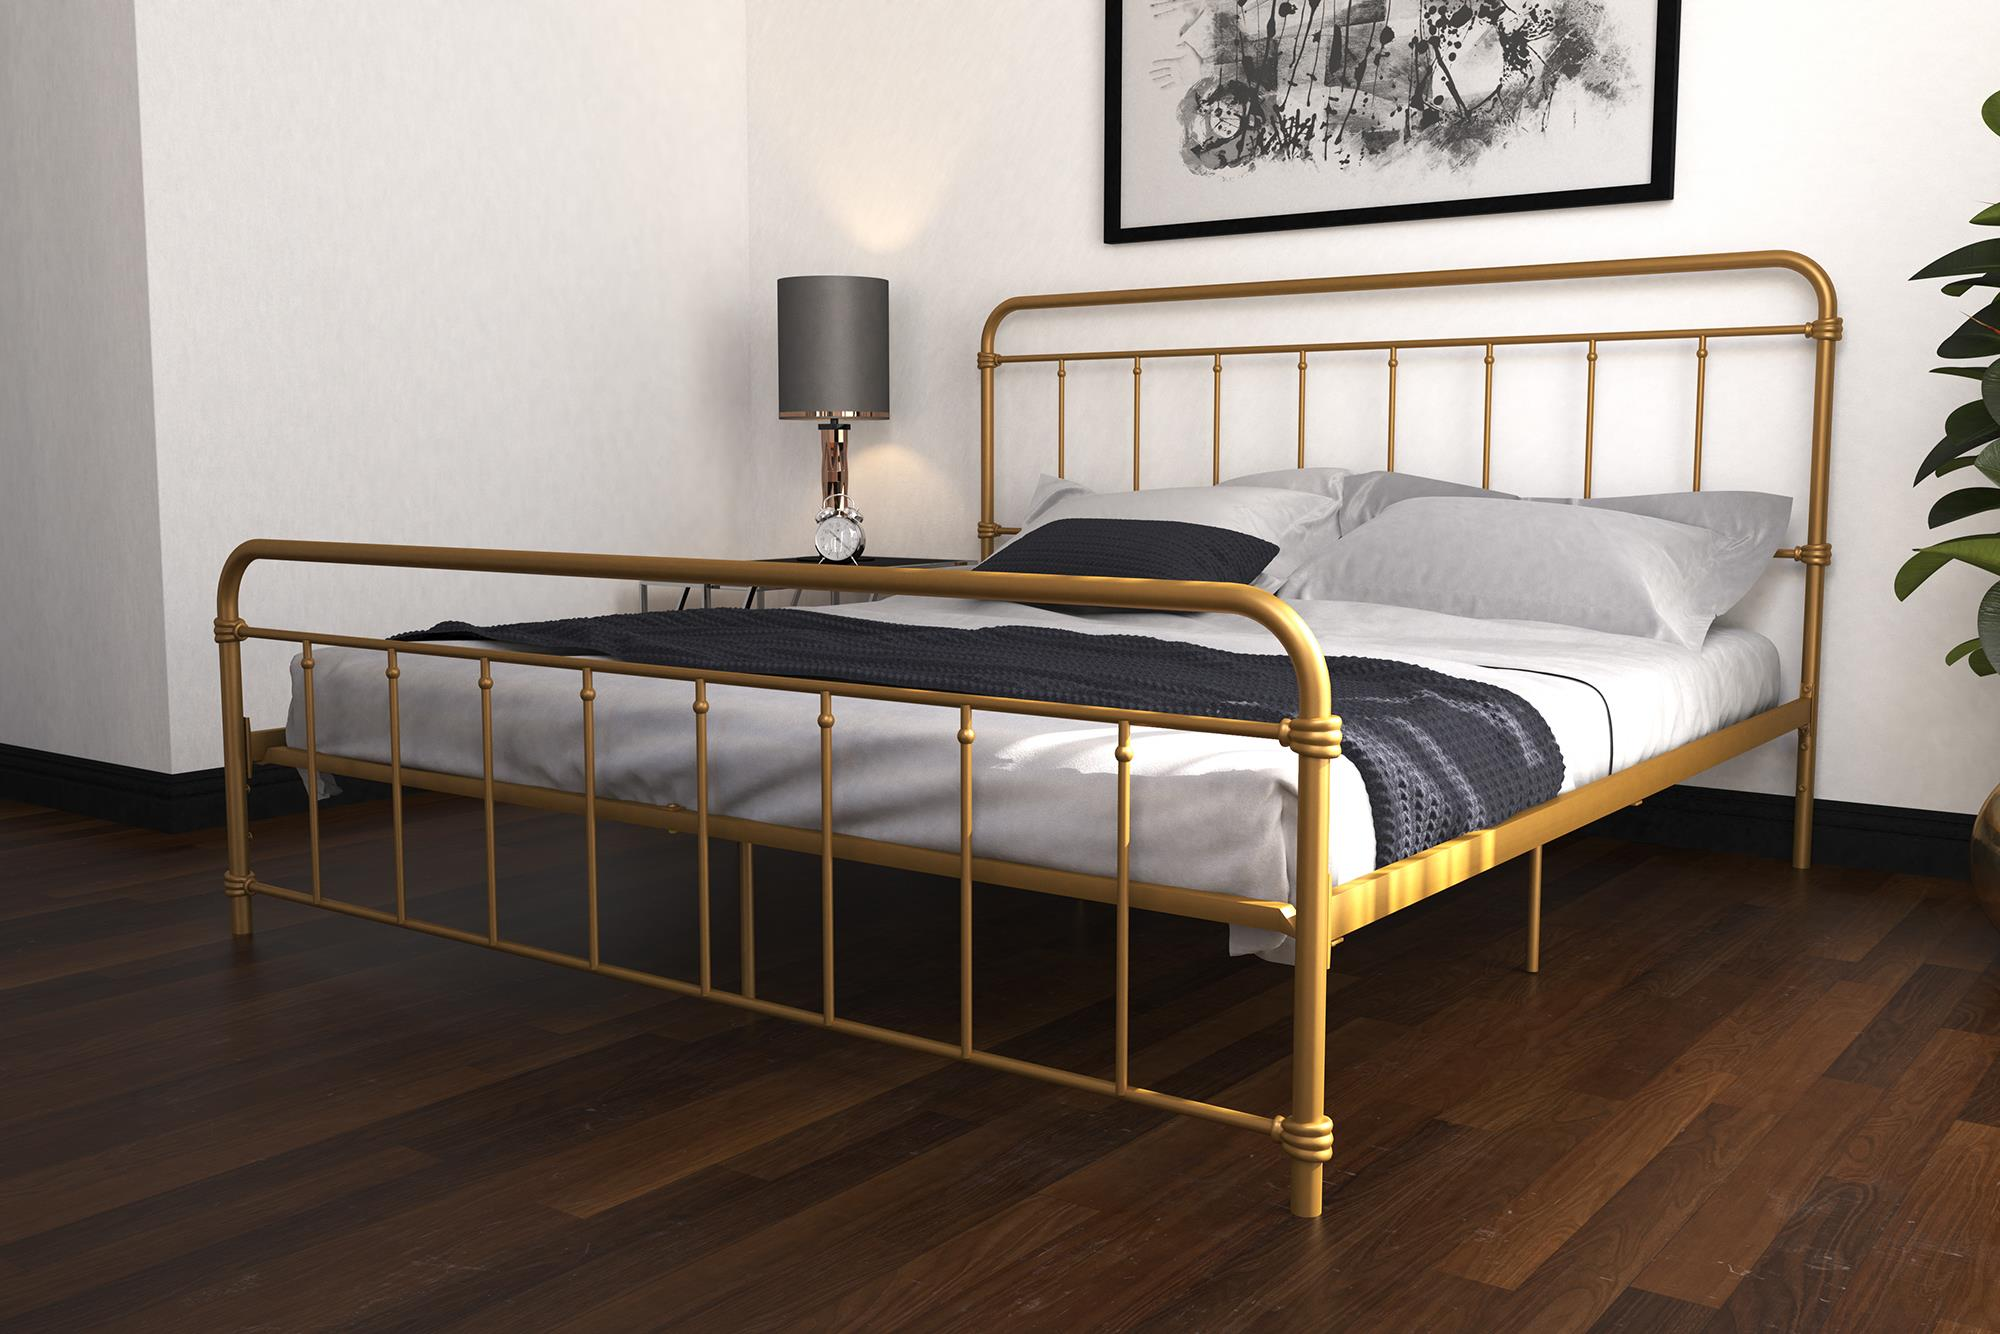 Dhp Wallace Metal Bed King Size Frame Underbed Storage Gold Walmart Com Walmart Com